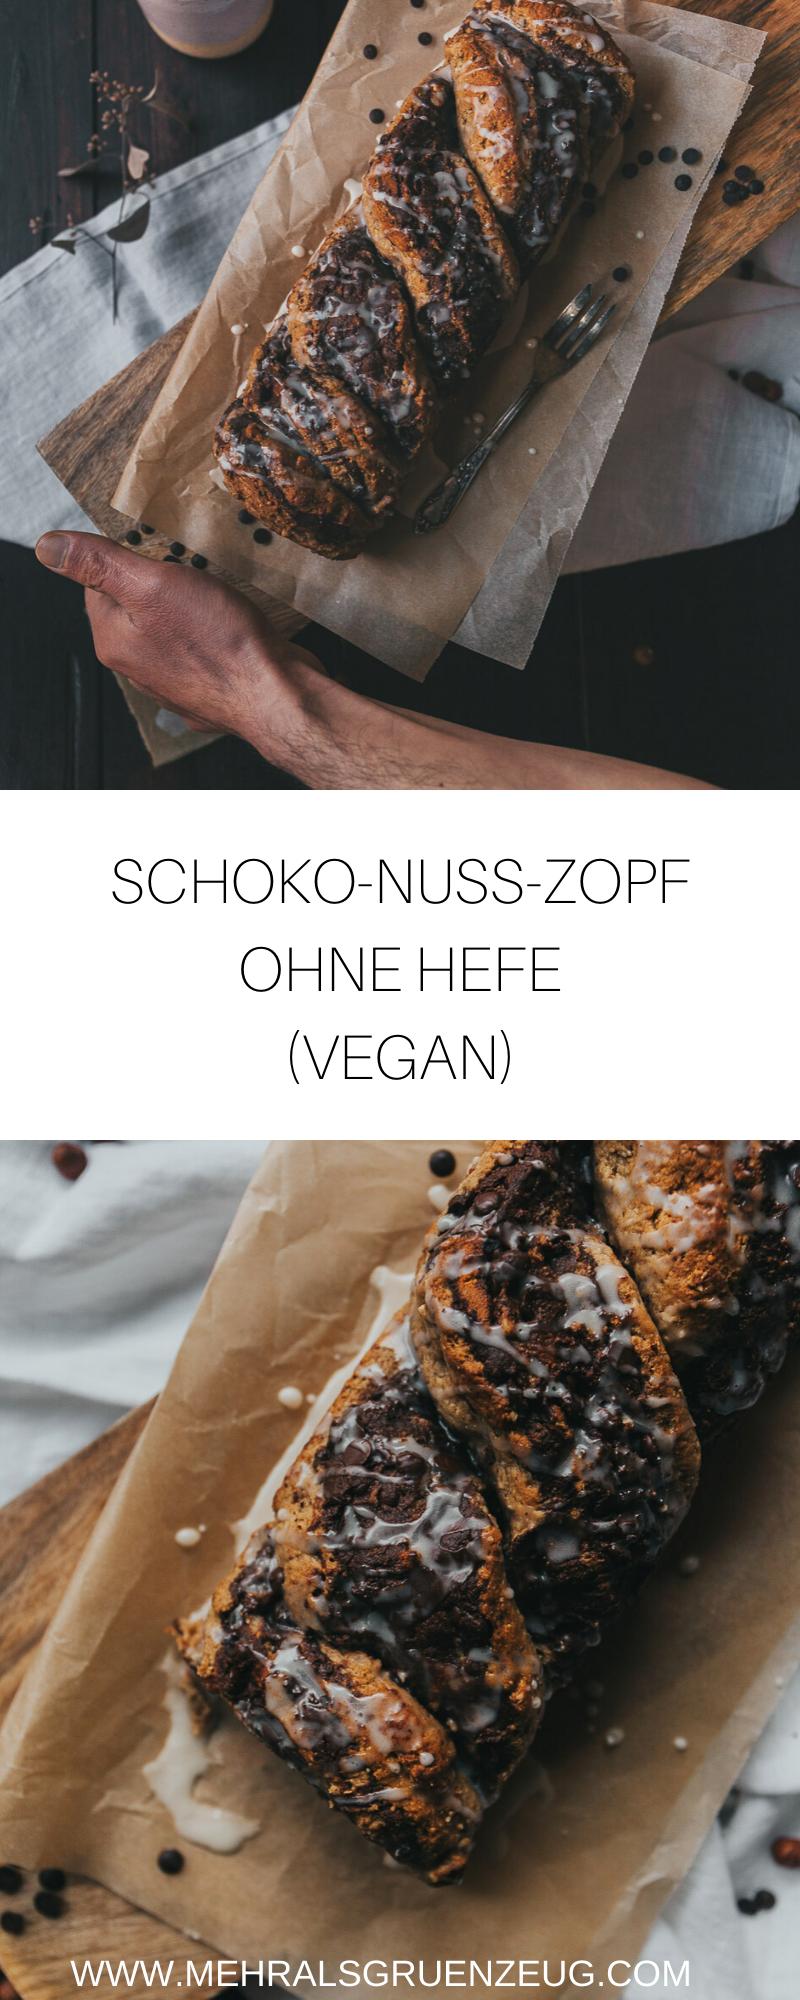 Veganer Schoko-Nuss-Zopf ohne Hefe